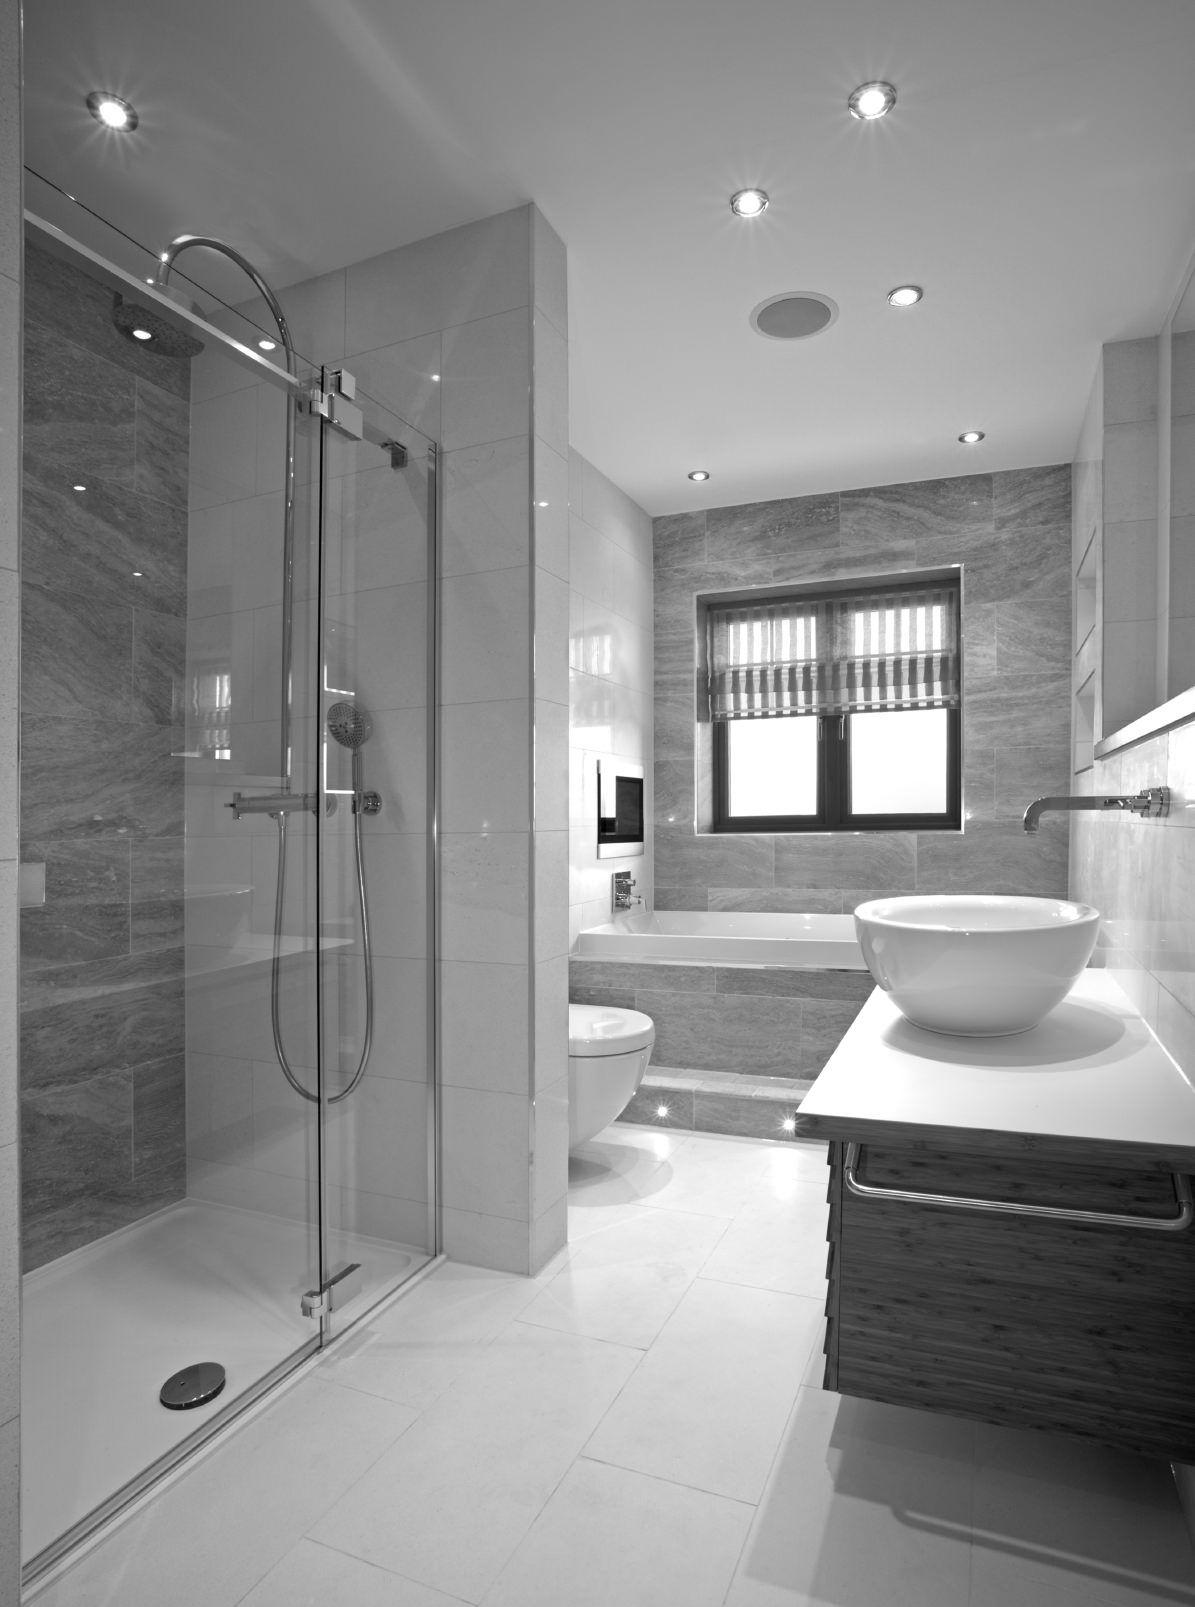 70 Sleek Modern Primary Bathroom Ideas (Photos)